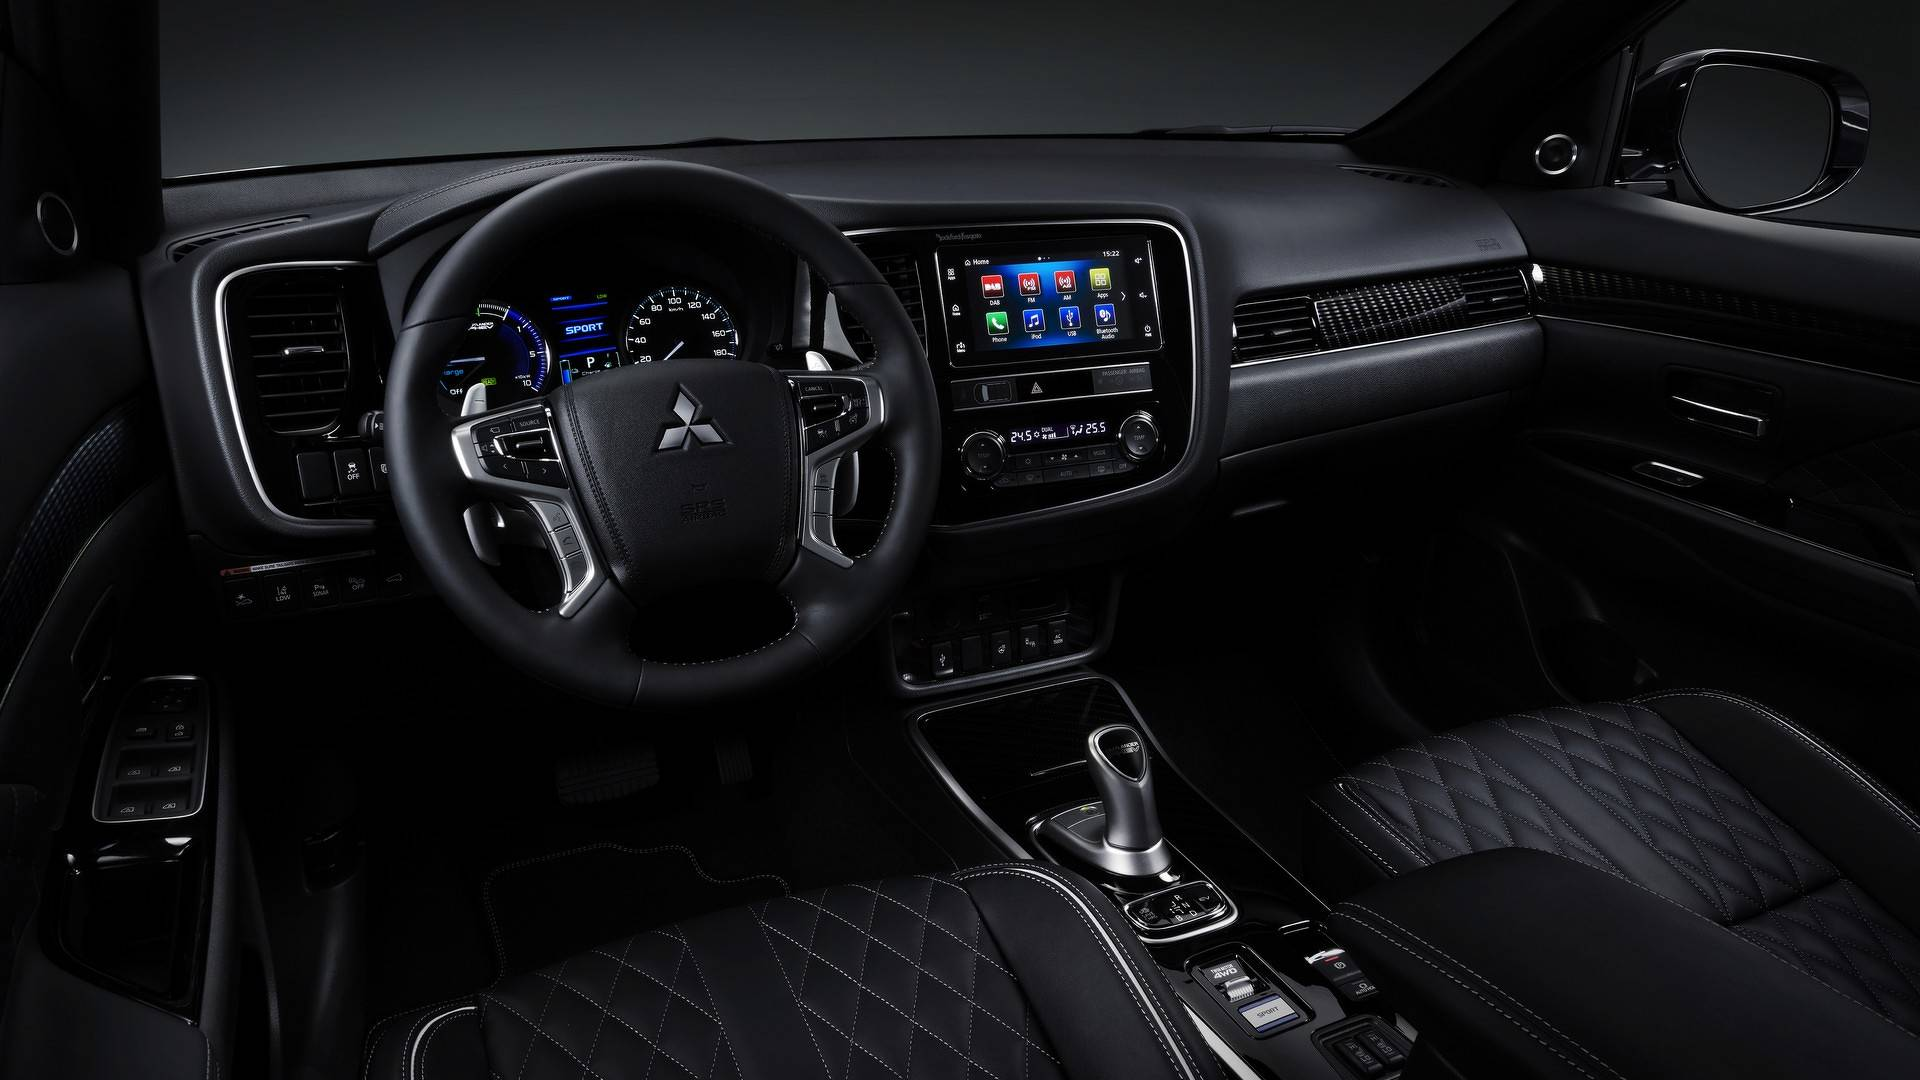 2019-Mitsubishi-Outlander-PHEV-Interior